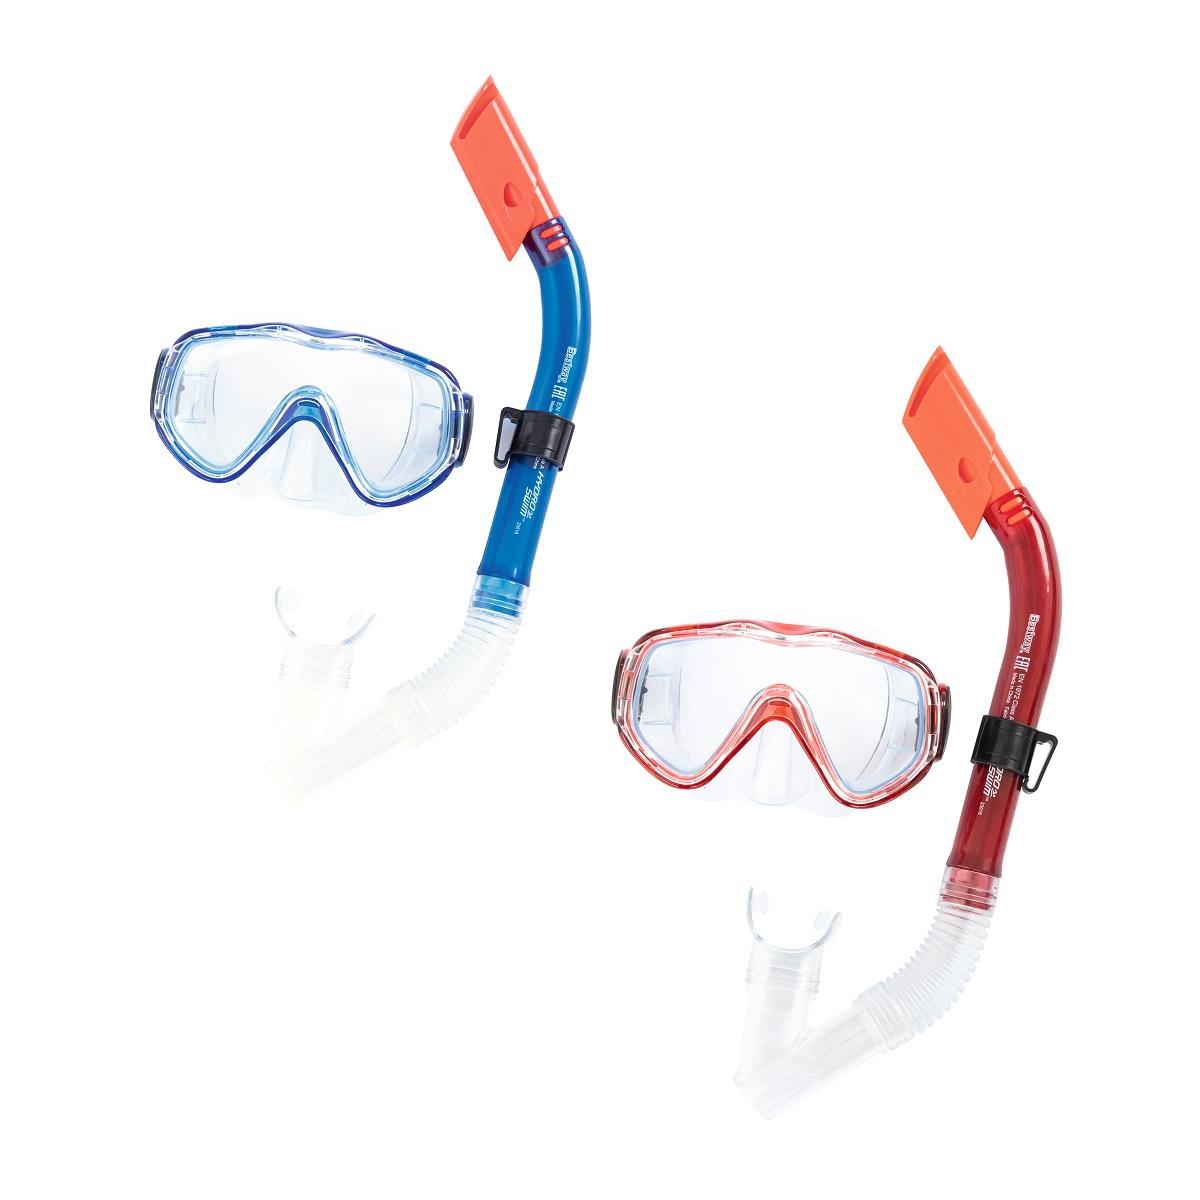 Potápěčský set BESTWAY Hydro Swim 24028